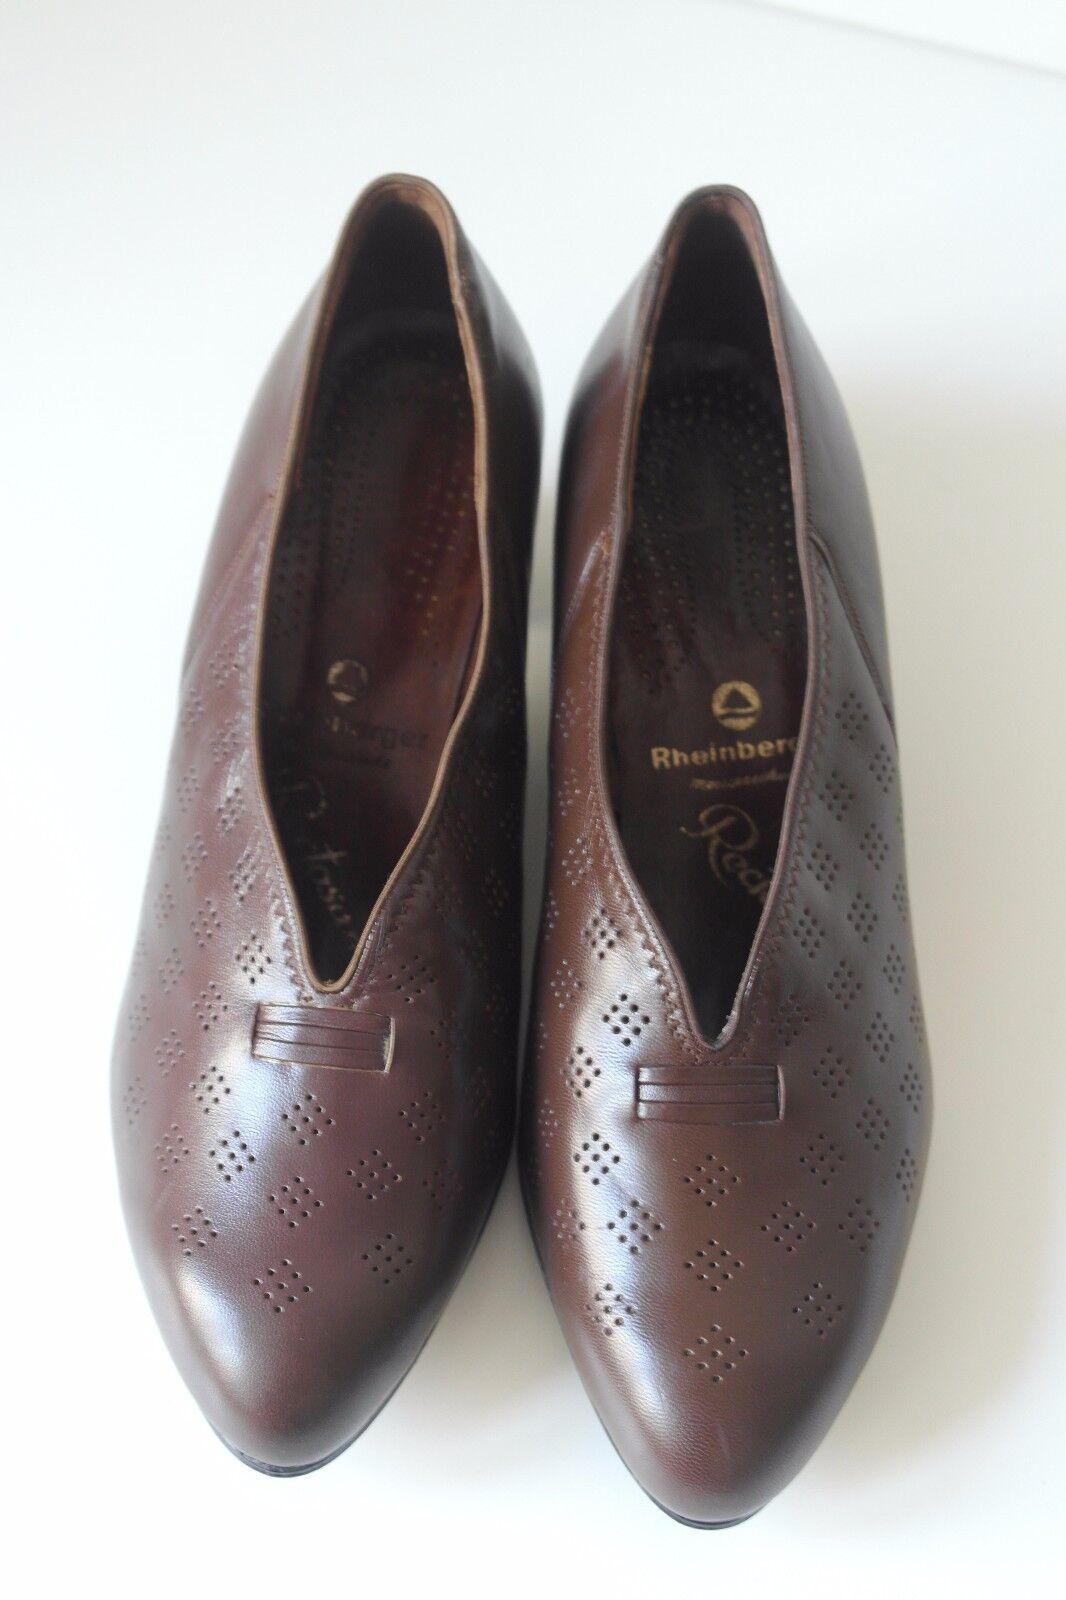 NOS Rheinberger Meisterschuhe Damen Pumps Schuhe TRUE VINTAGE UK Erany UK VINTAGE 5,5 braun e8ead5